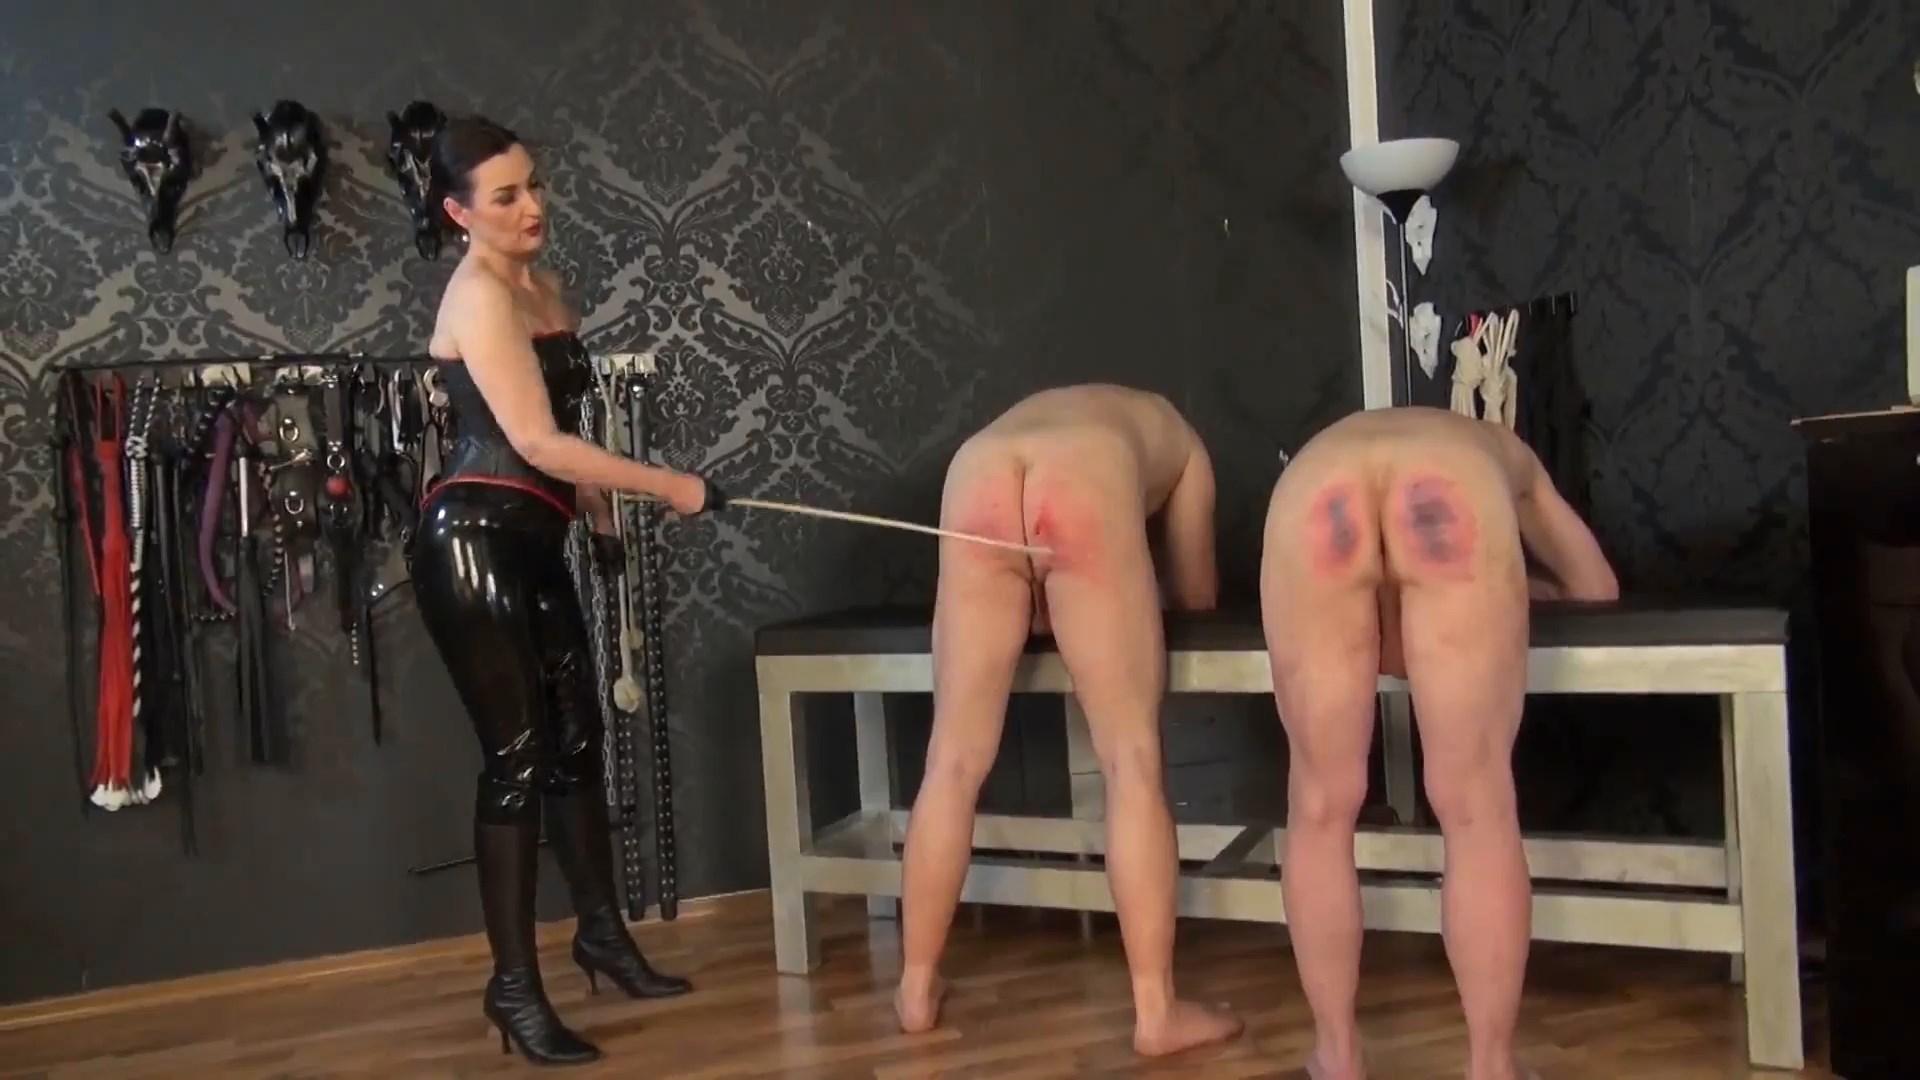 Cane Treatment Of 2 Slaves - LADY VICTORIA VALENTE - FULL HD/1080p/MP4